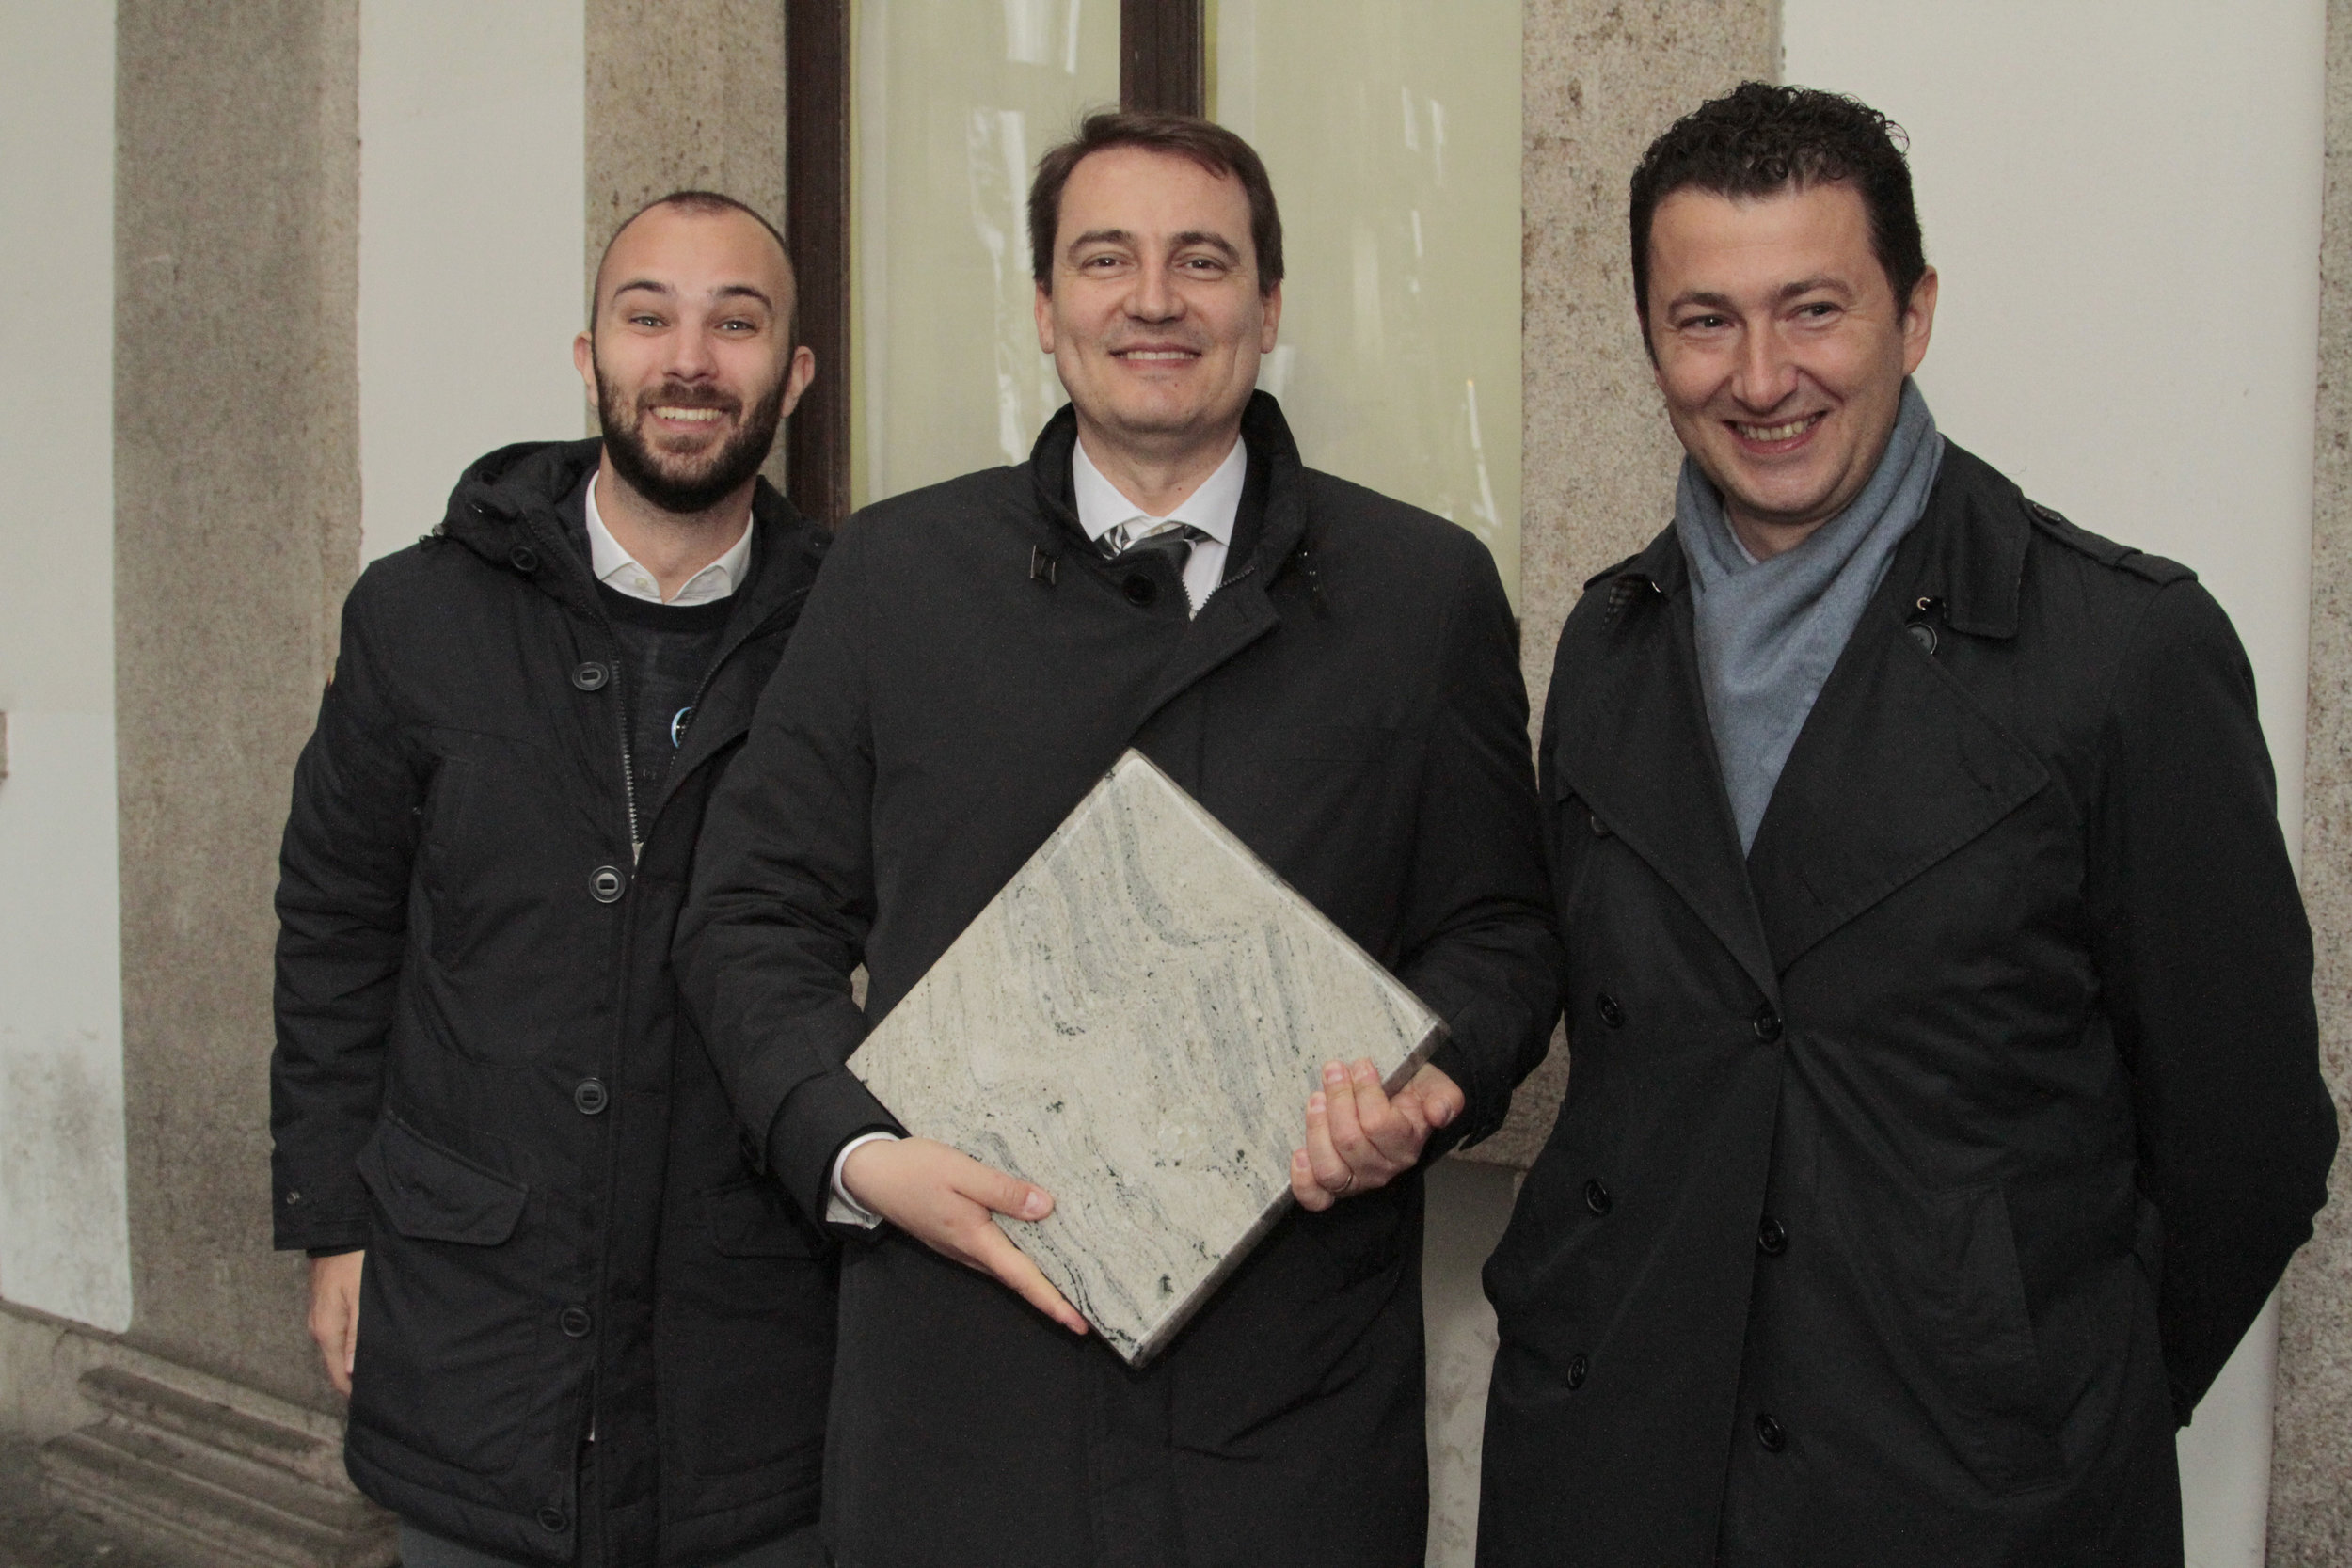 Nicola Ferrarese, Jacopo Pavani e Felippo Coffele